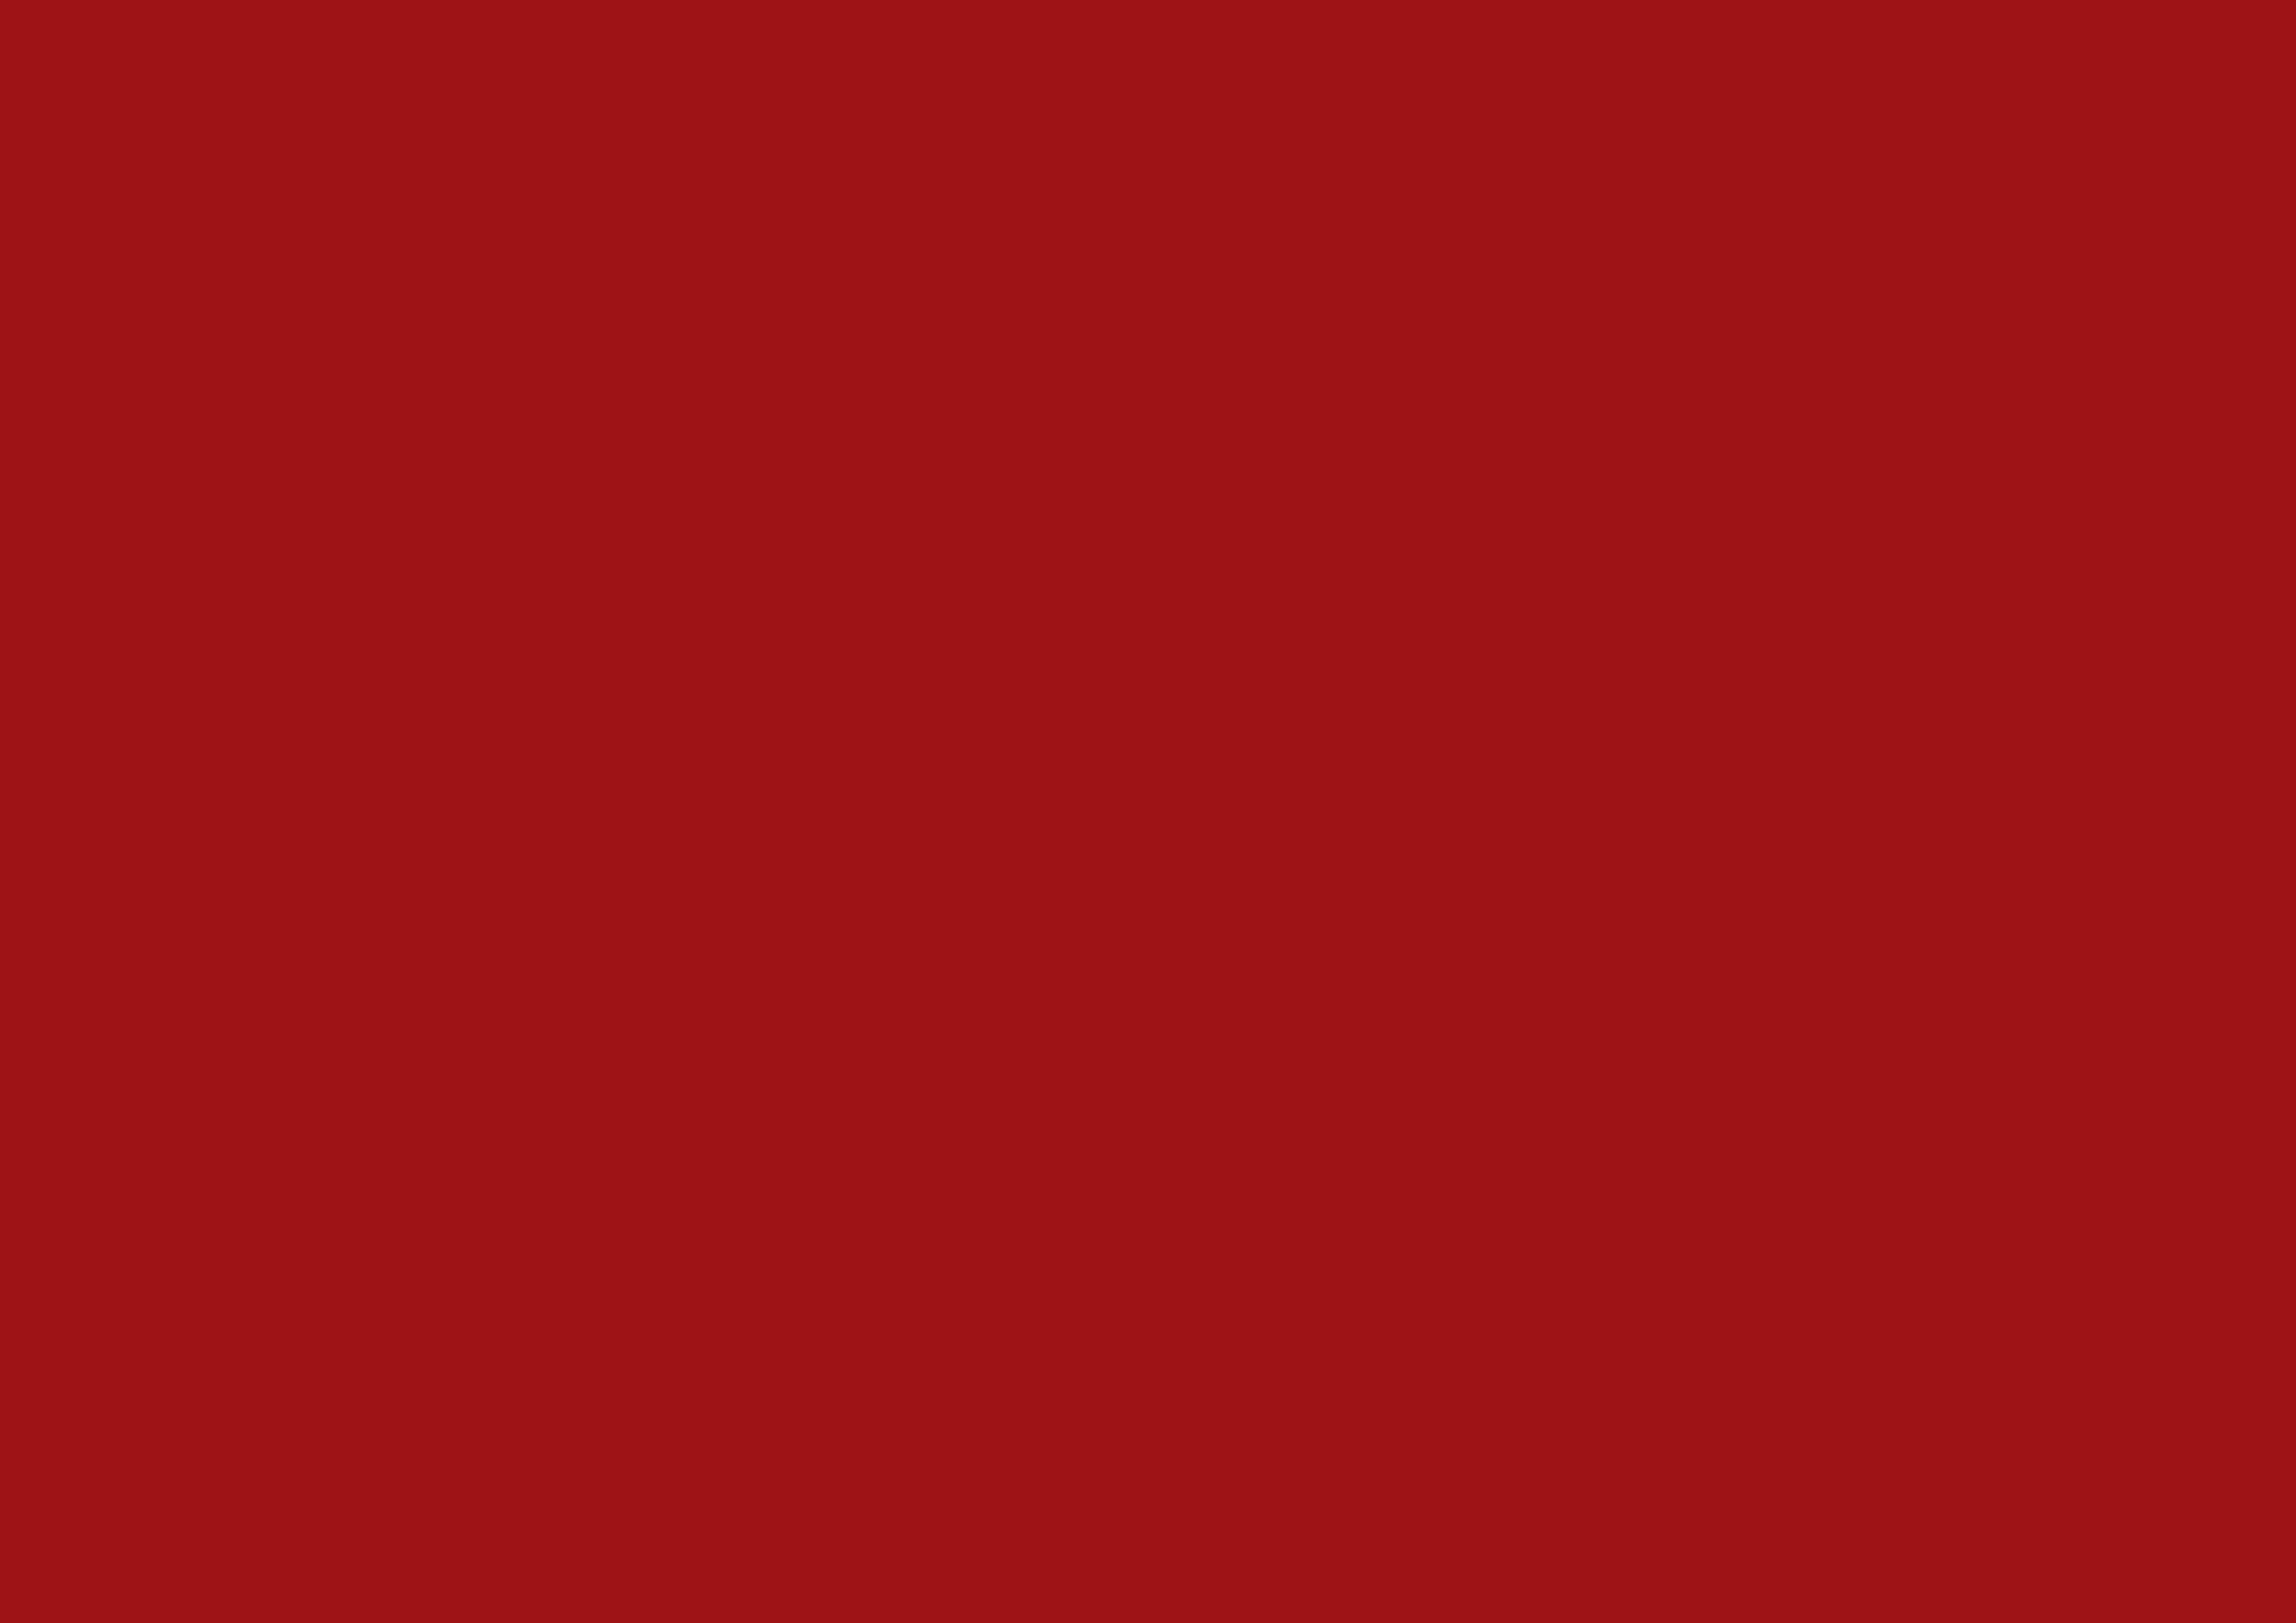 3508x2480 Spartan Crimson Solid Color Background